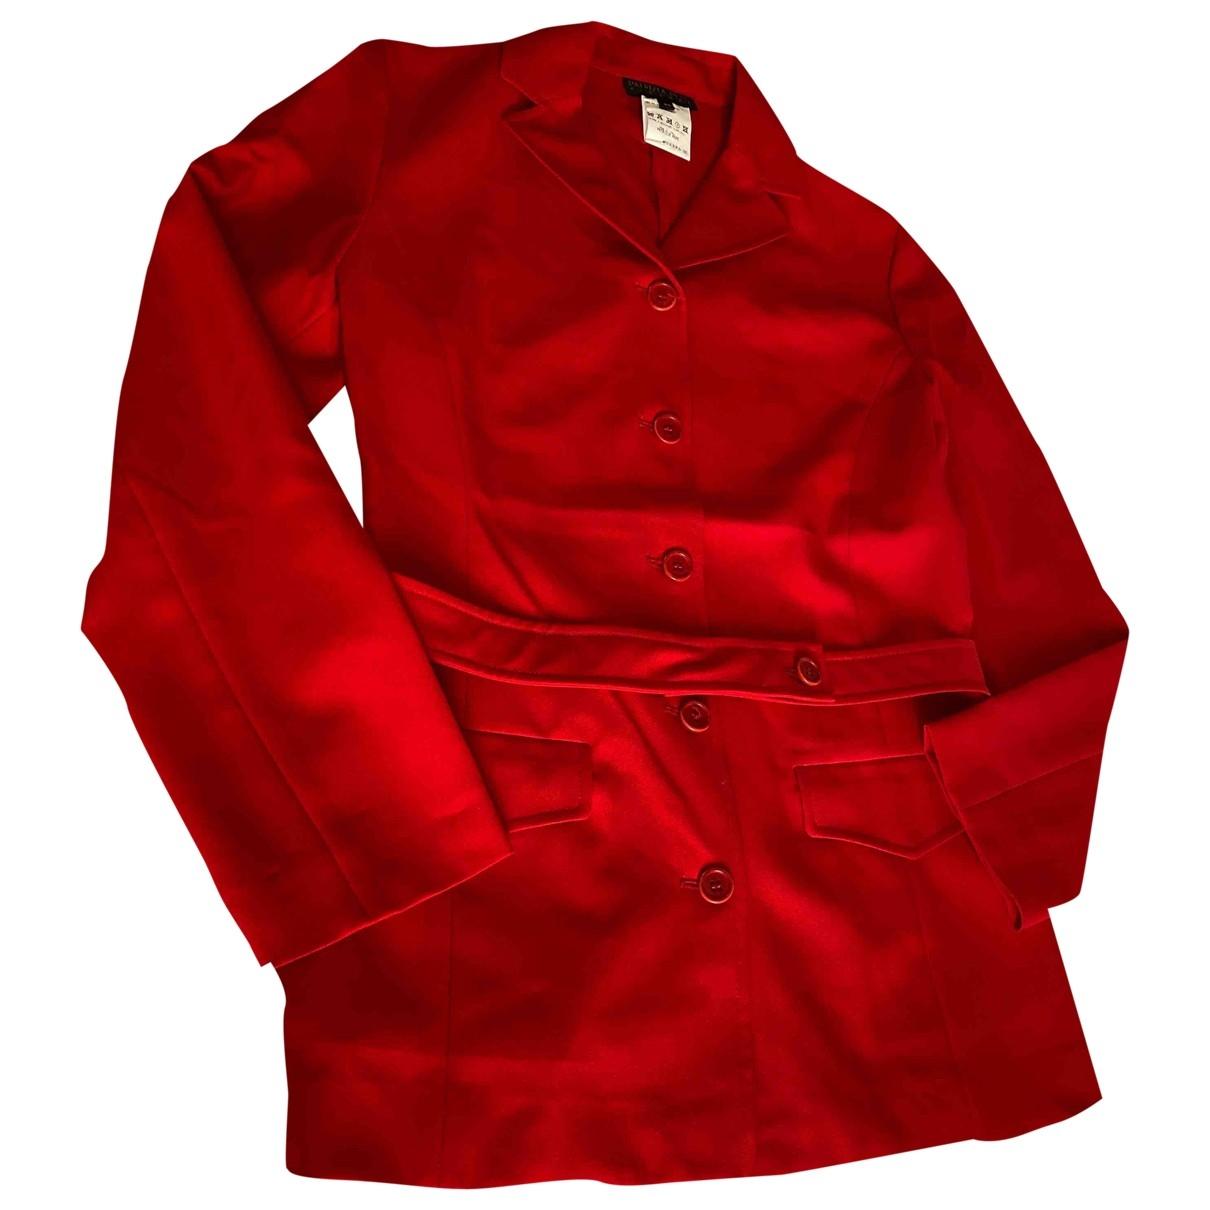 Patrizia Pepe \N Red jacket for Women 44 IT